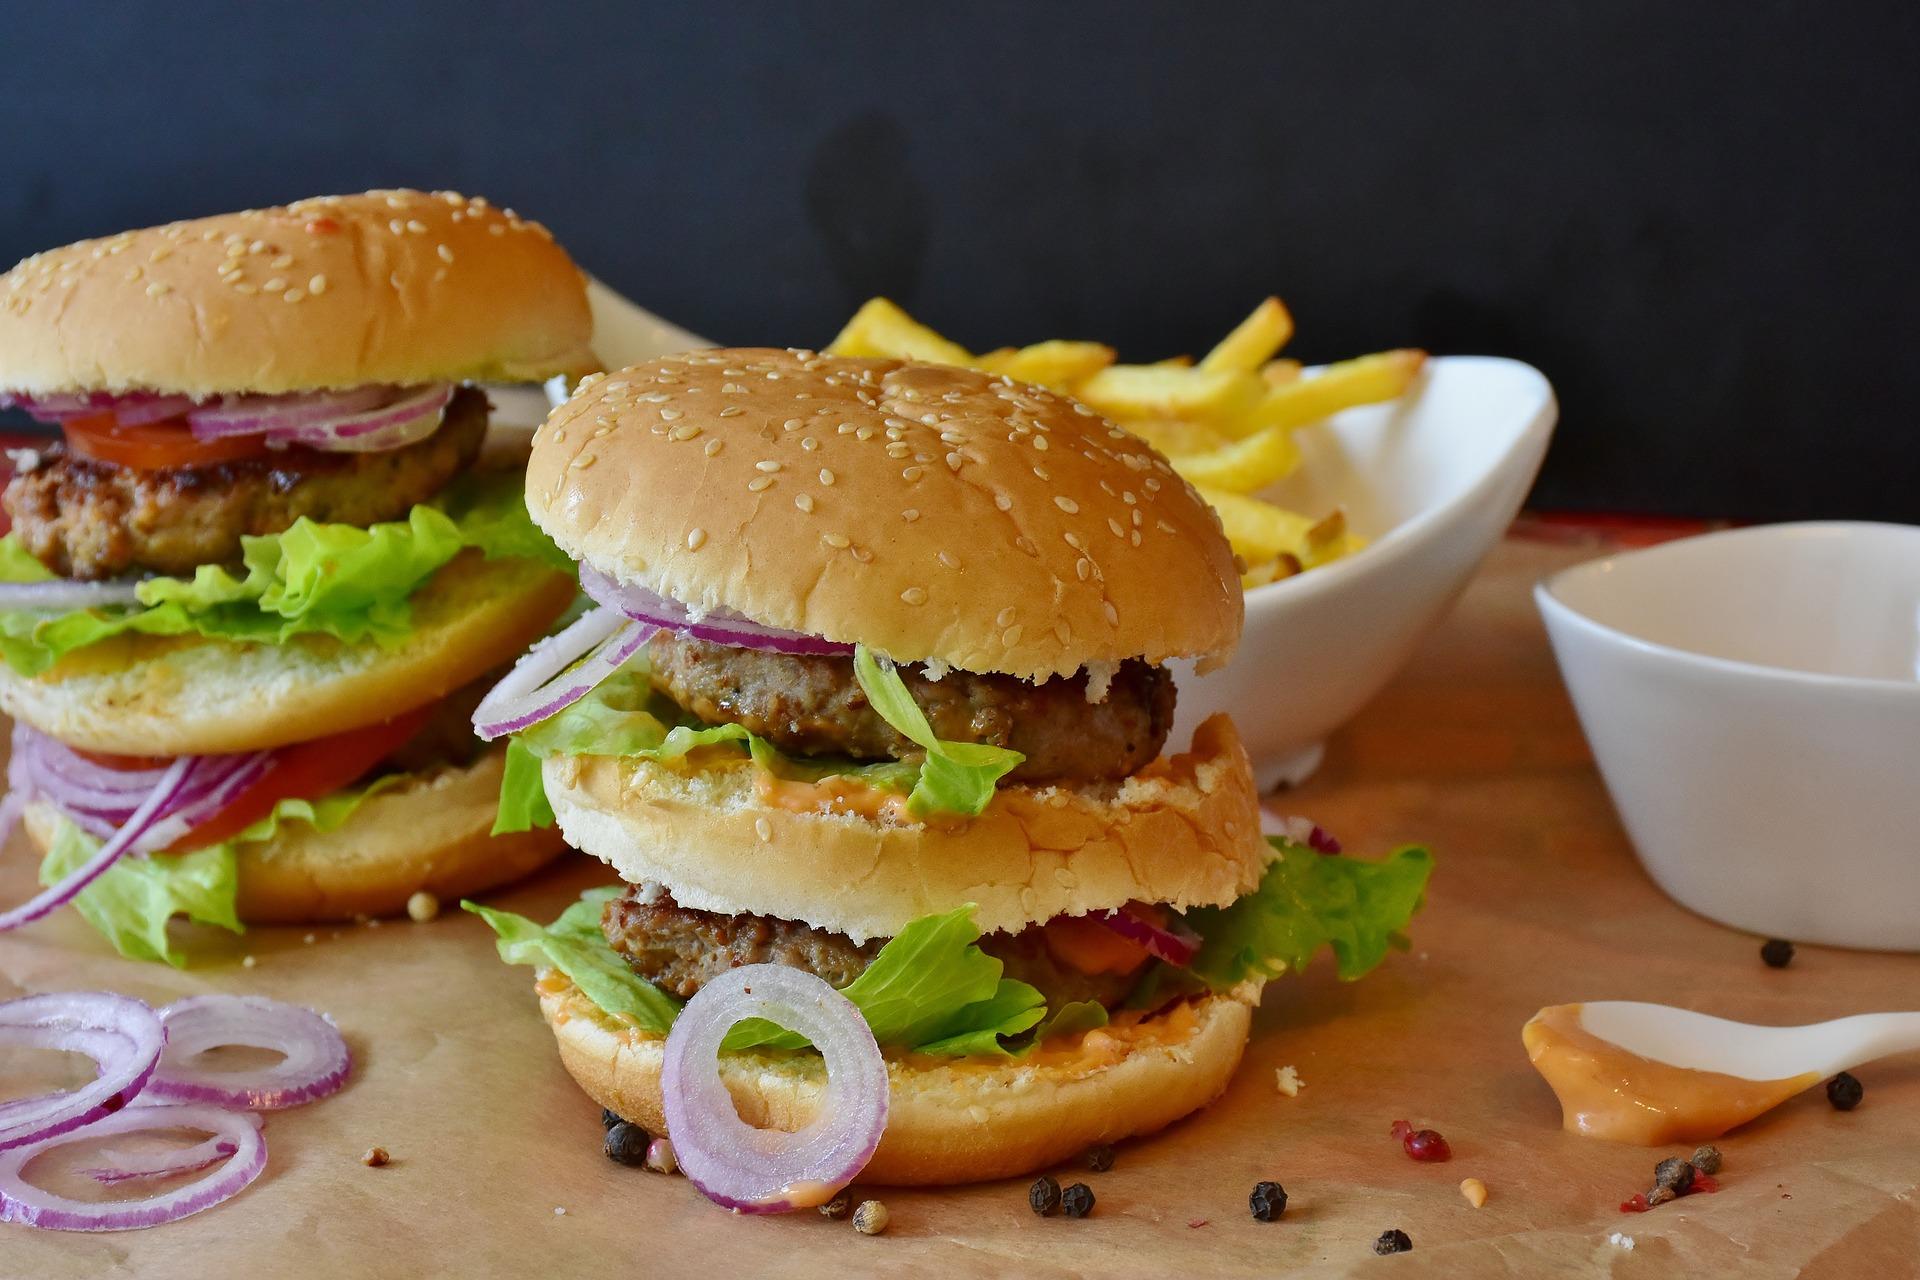 burger-2762371_1920.jpg